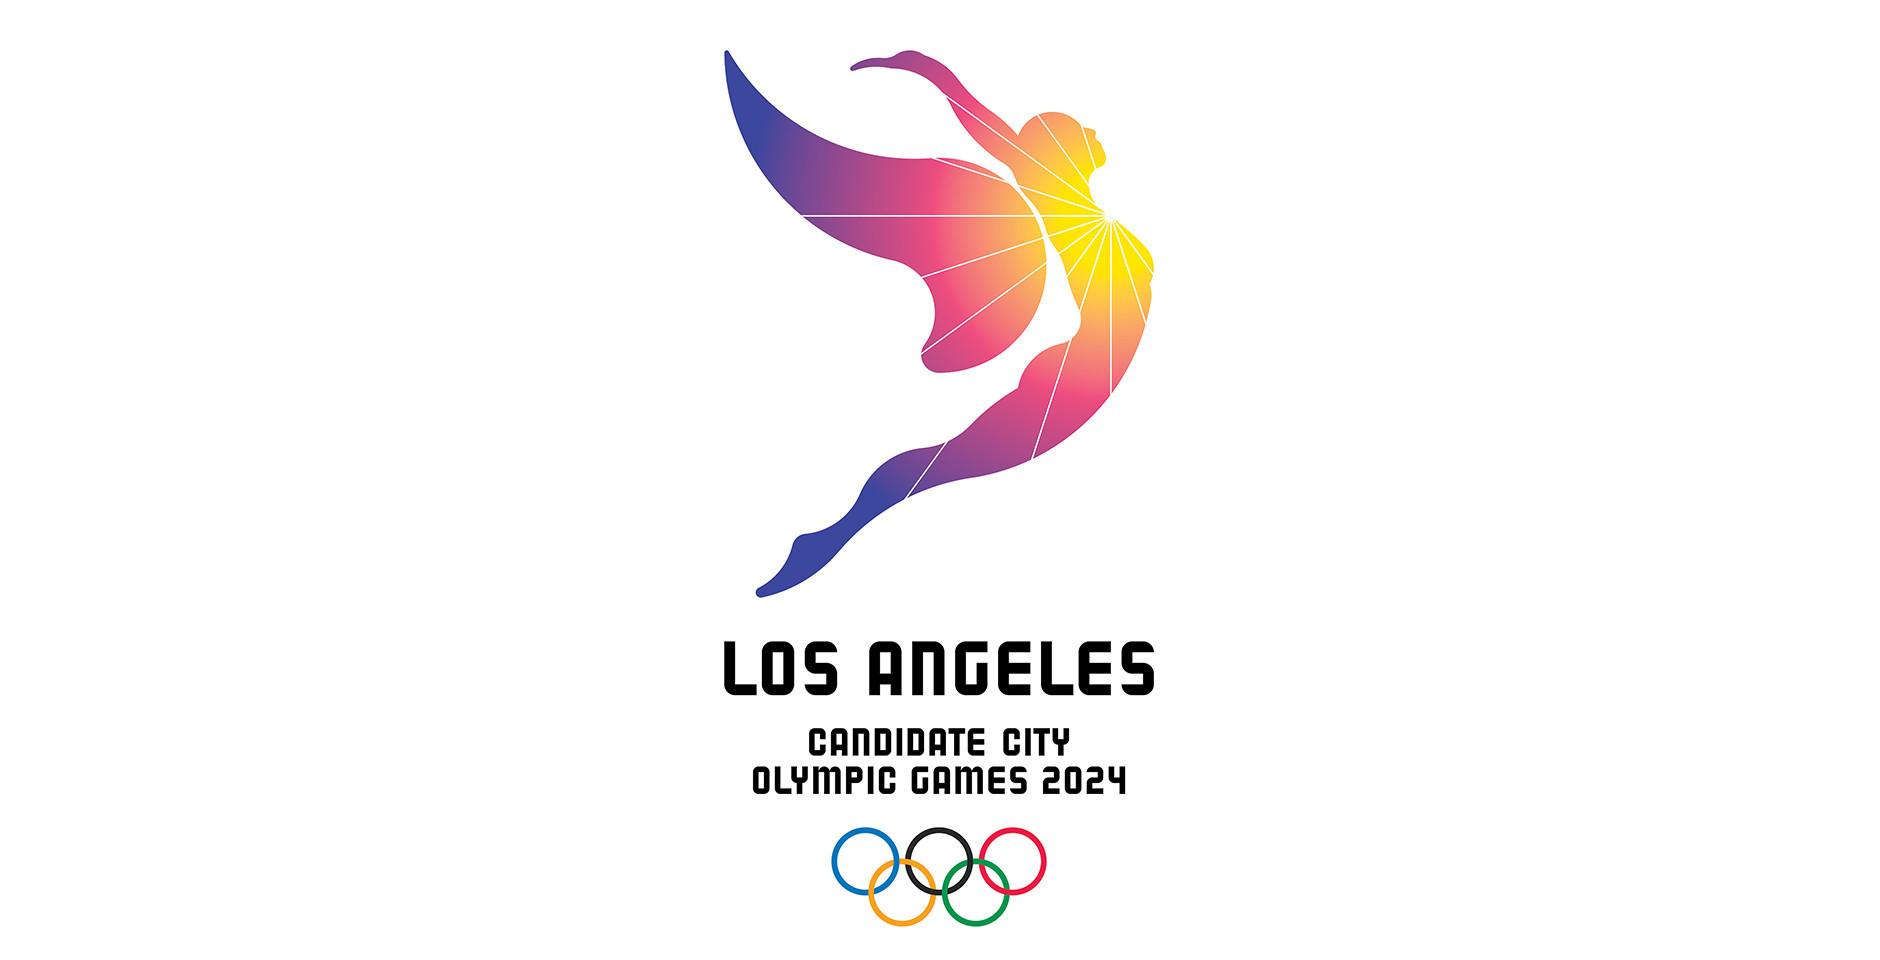 la-sp-sn-la-2024-olympic-logo-20160216.jpg